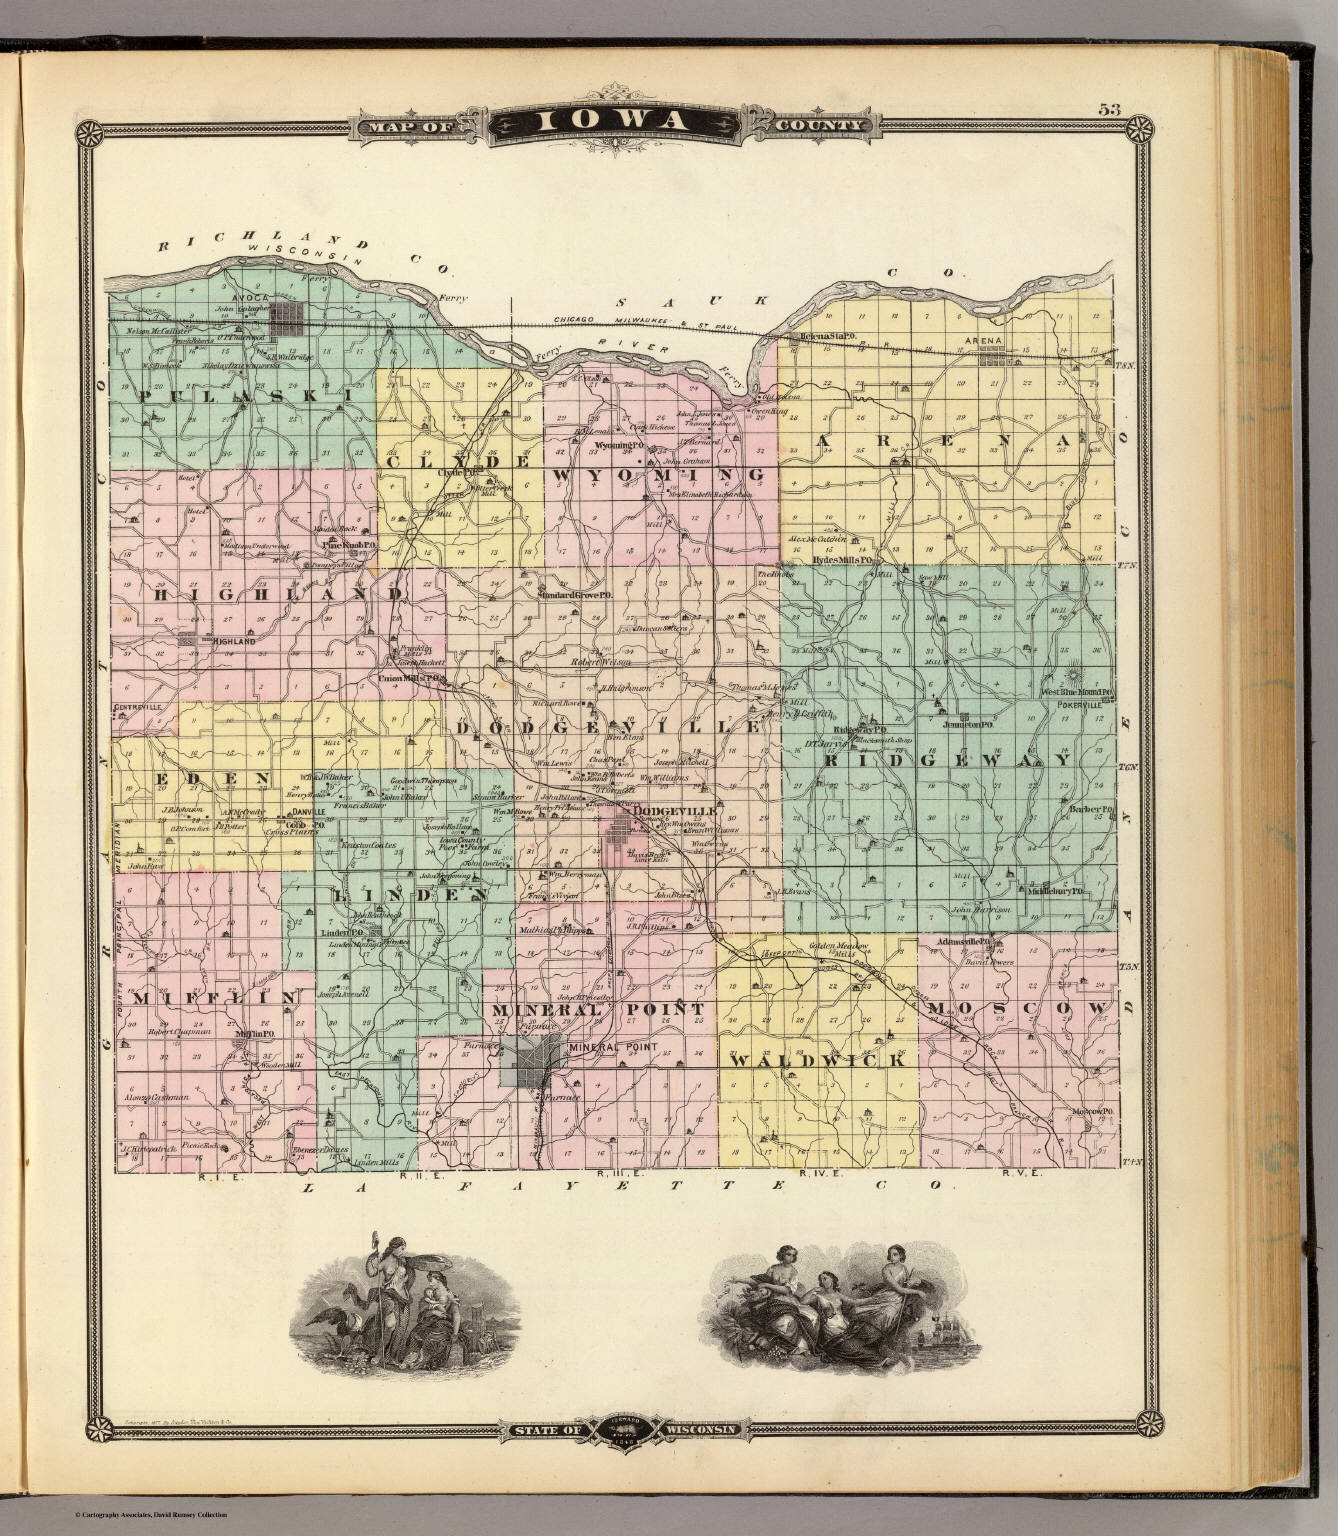 Iowa County Iowa Map.Map Of Iowa County State Of Wisconsin David Rumsey Historical